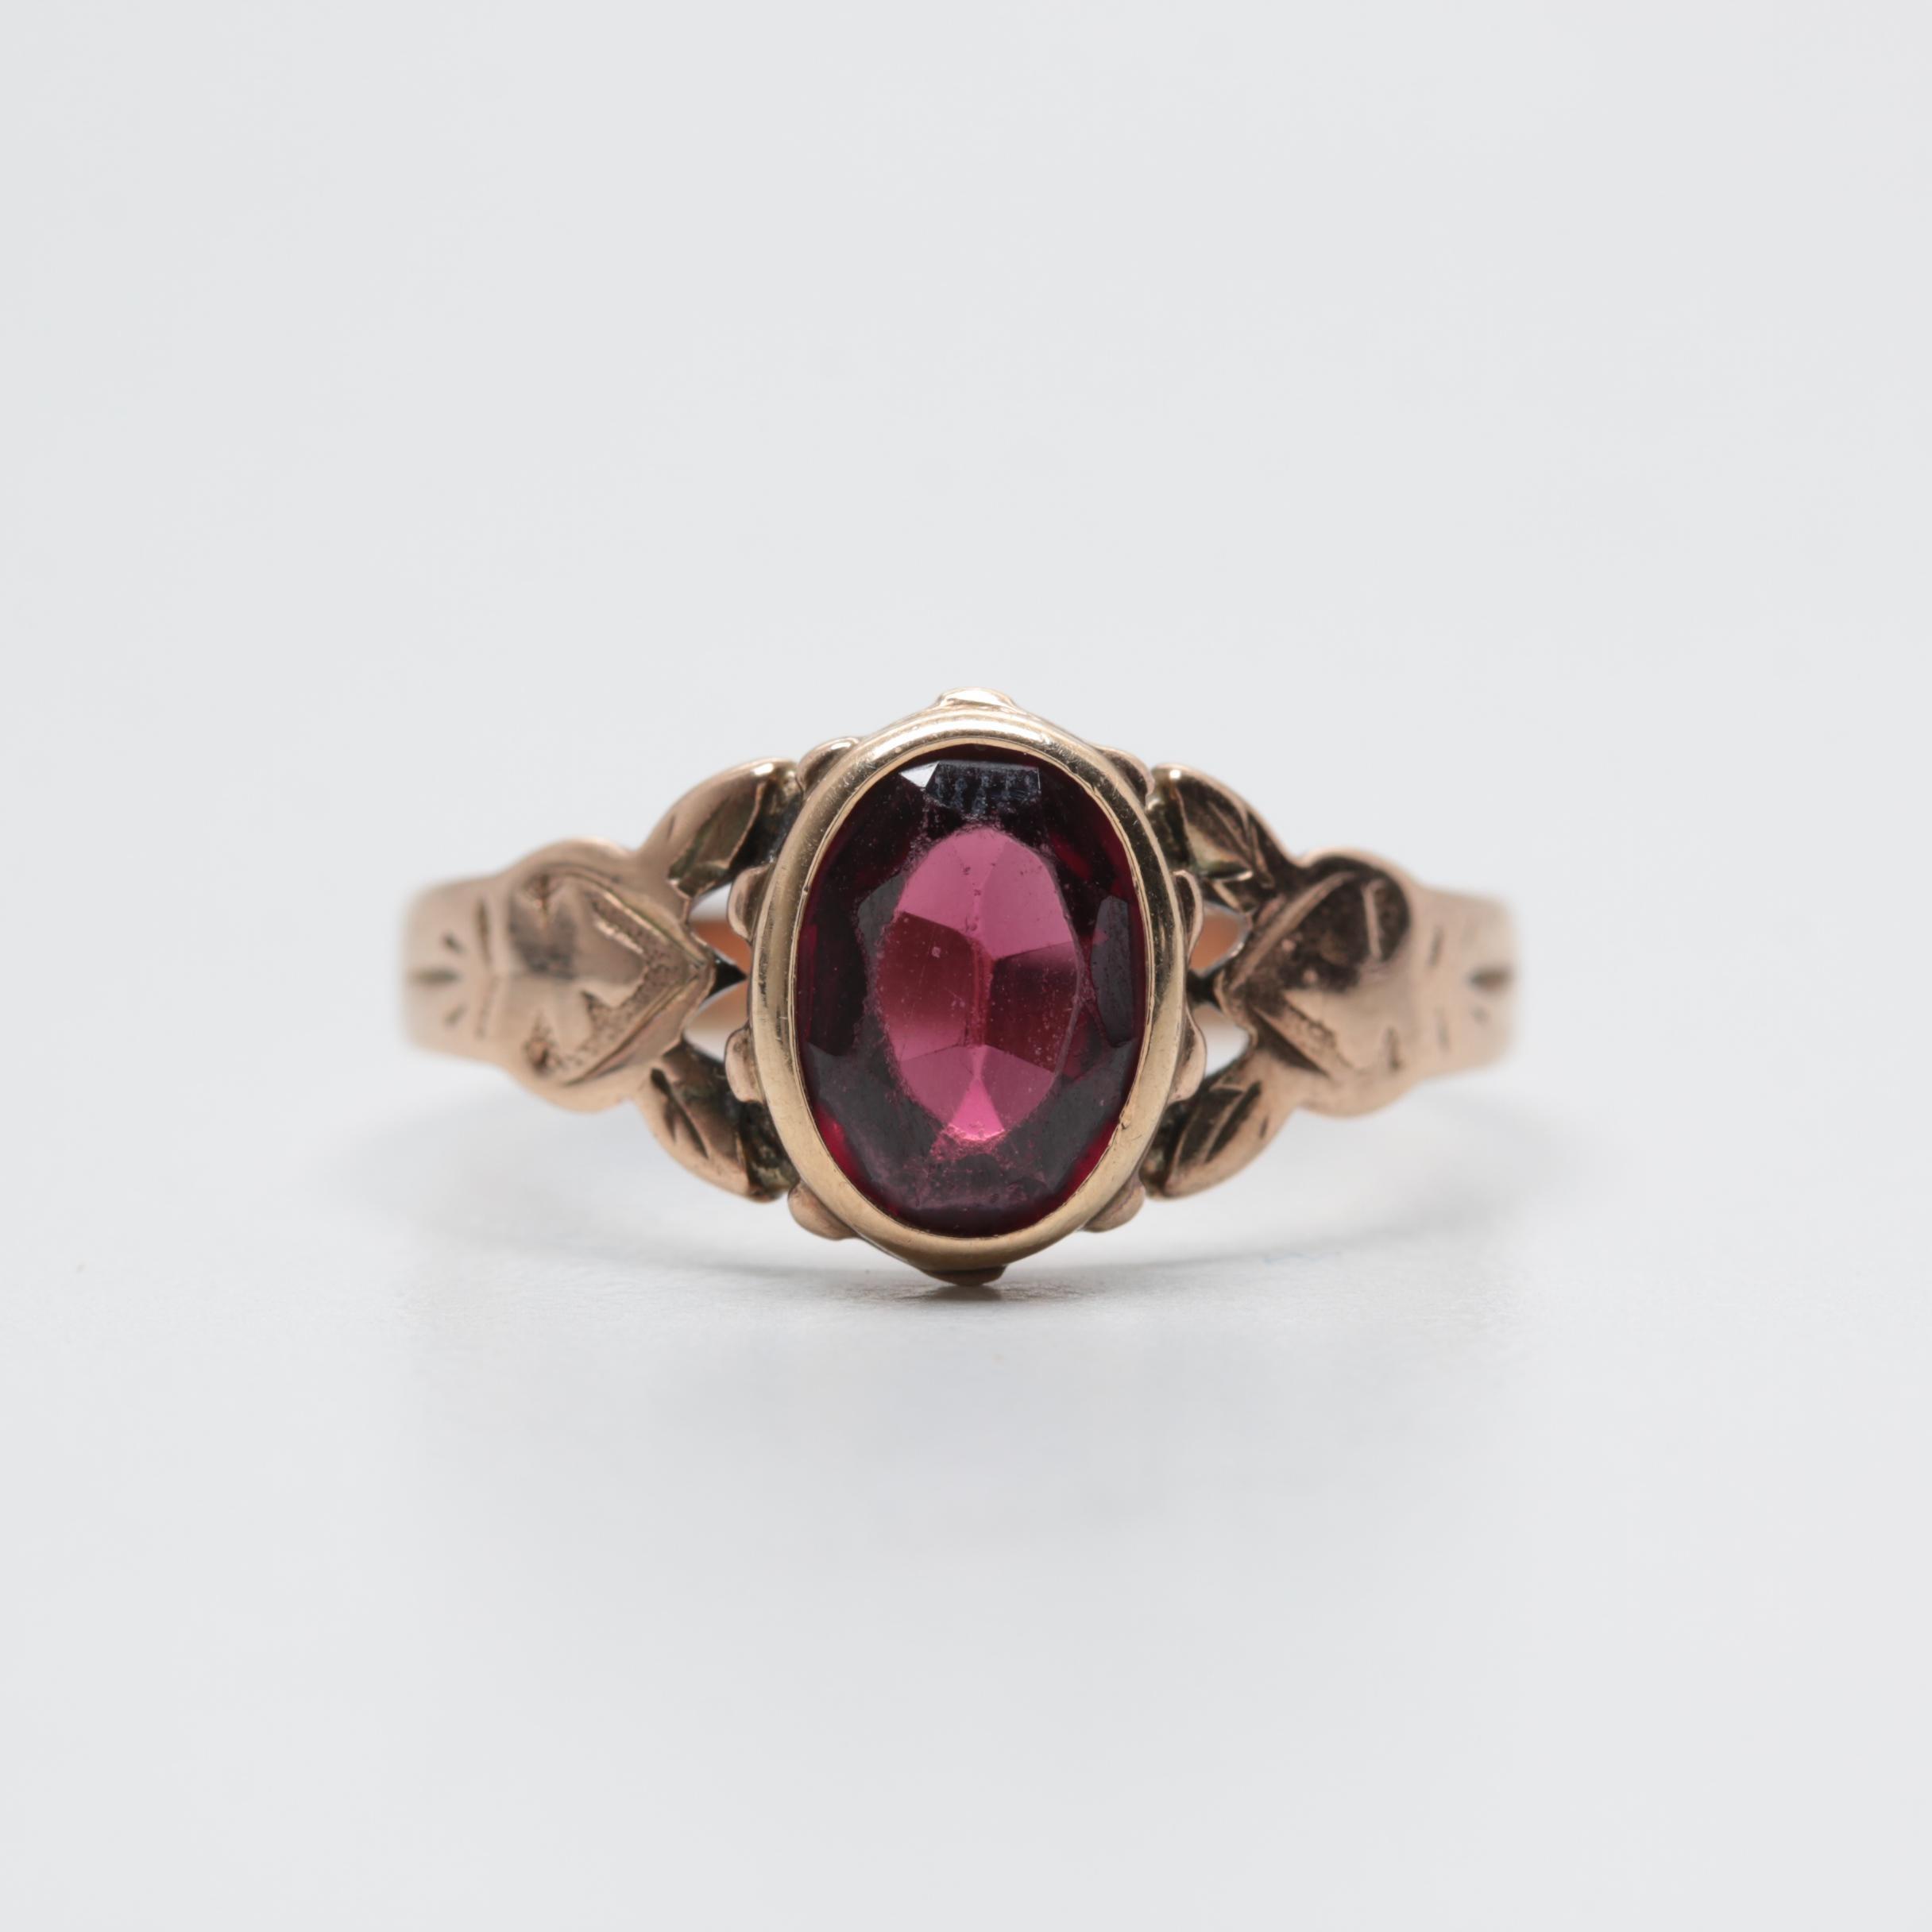 Victorian 10K Rose Gold Garnet Ring